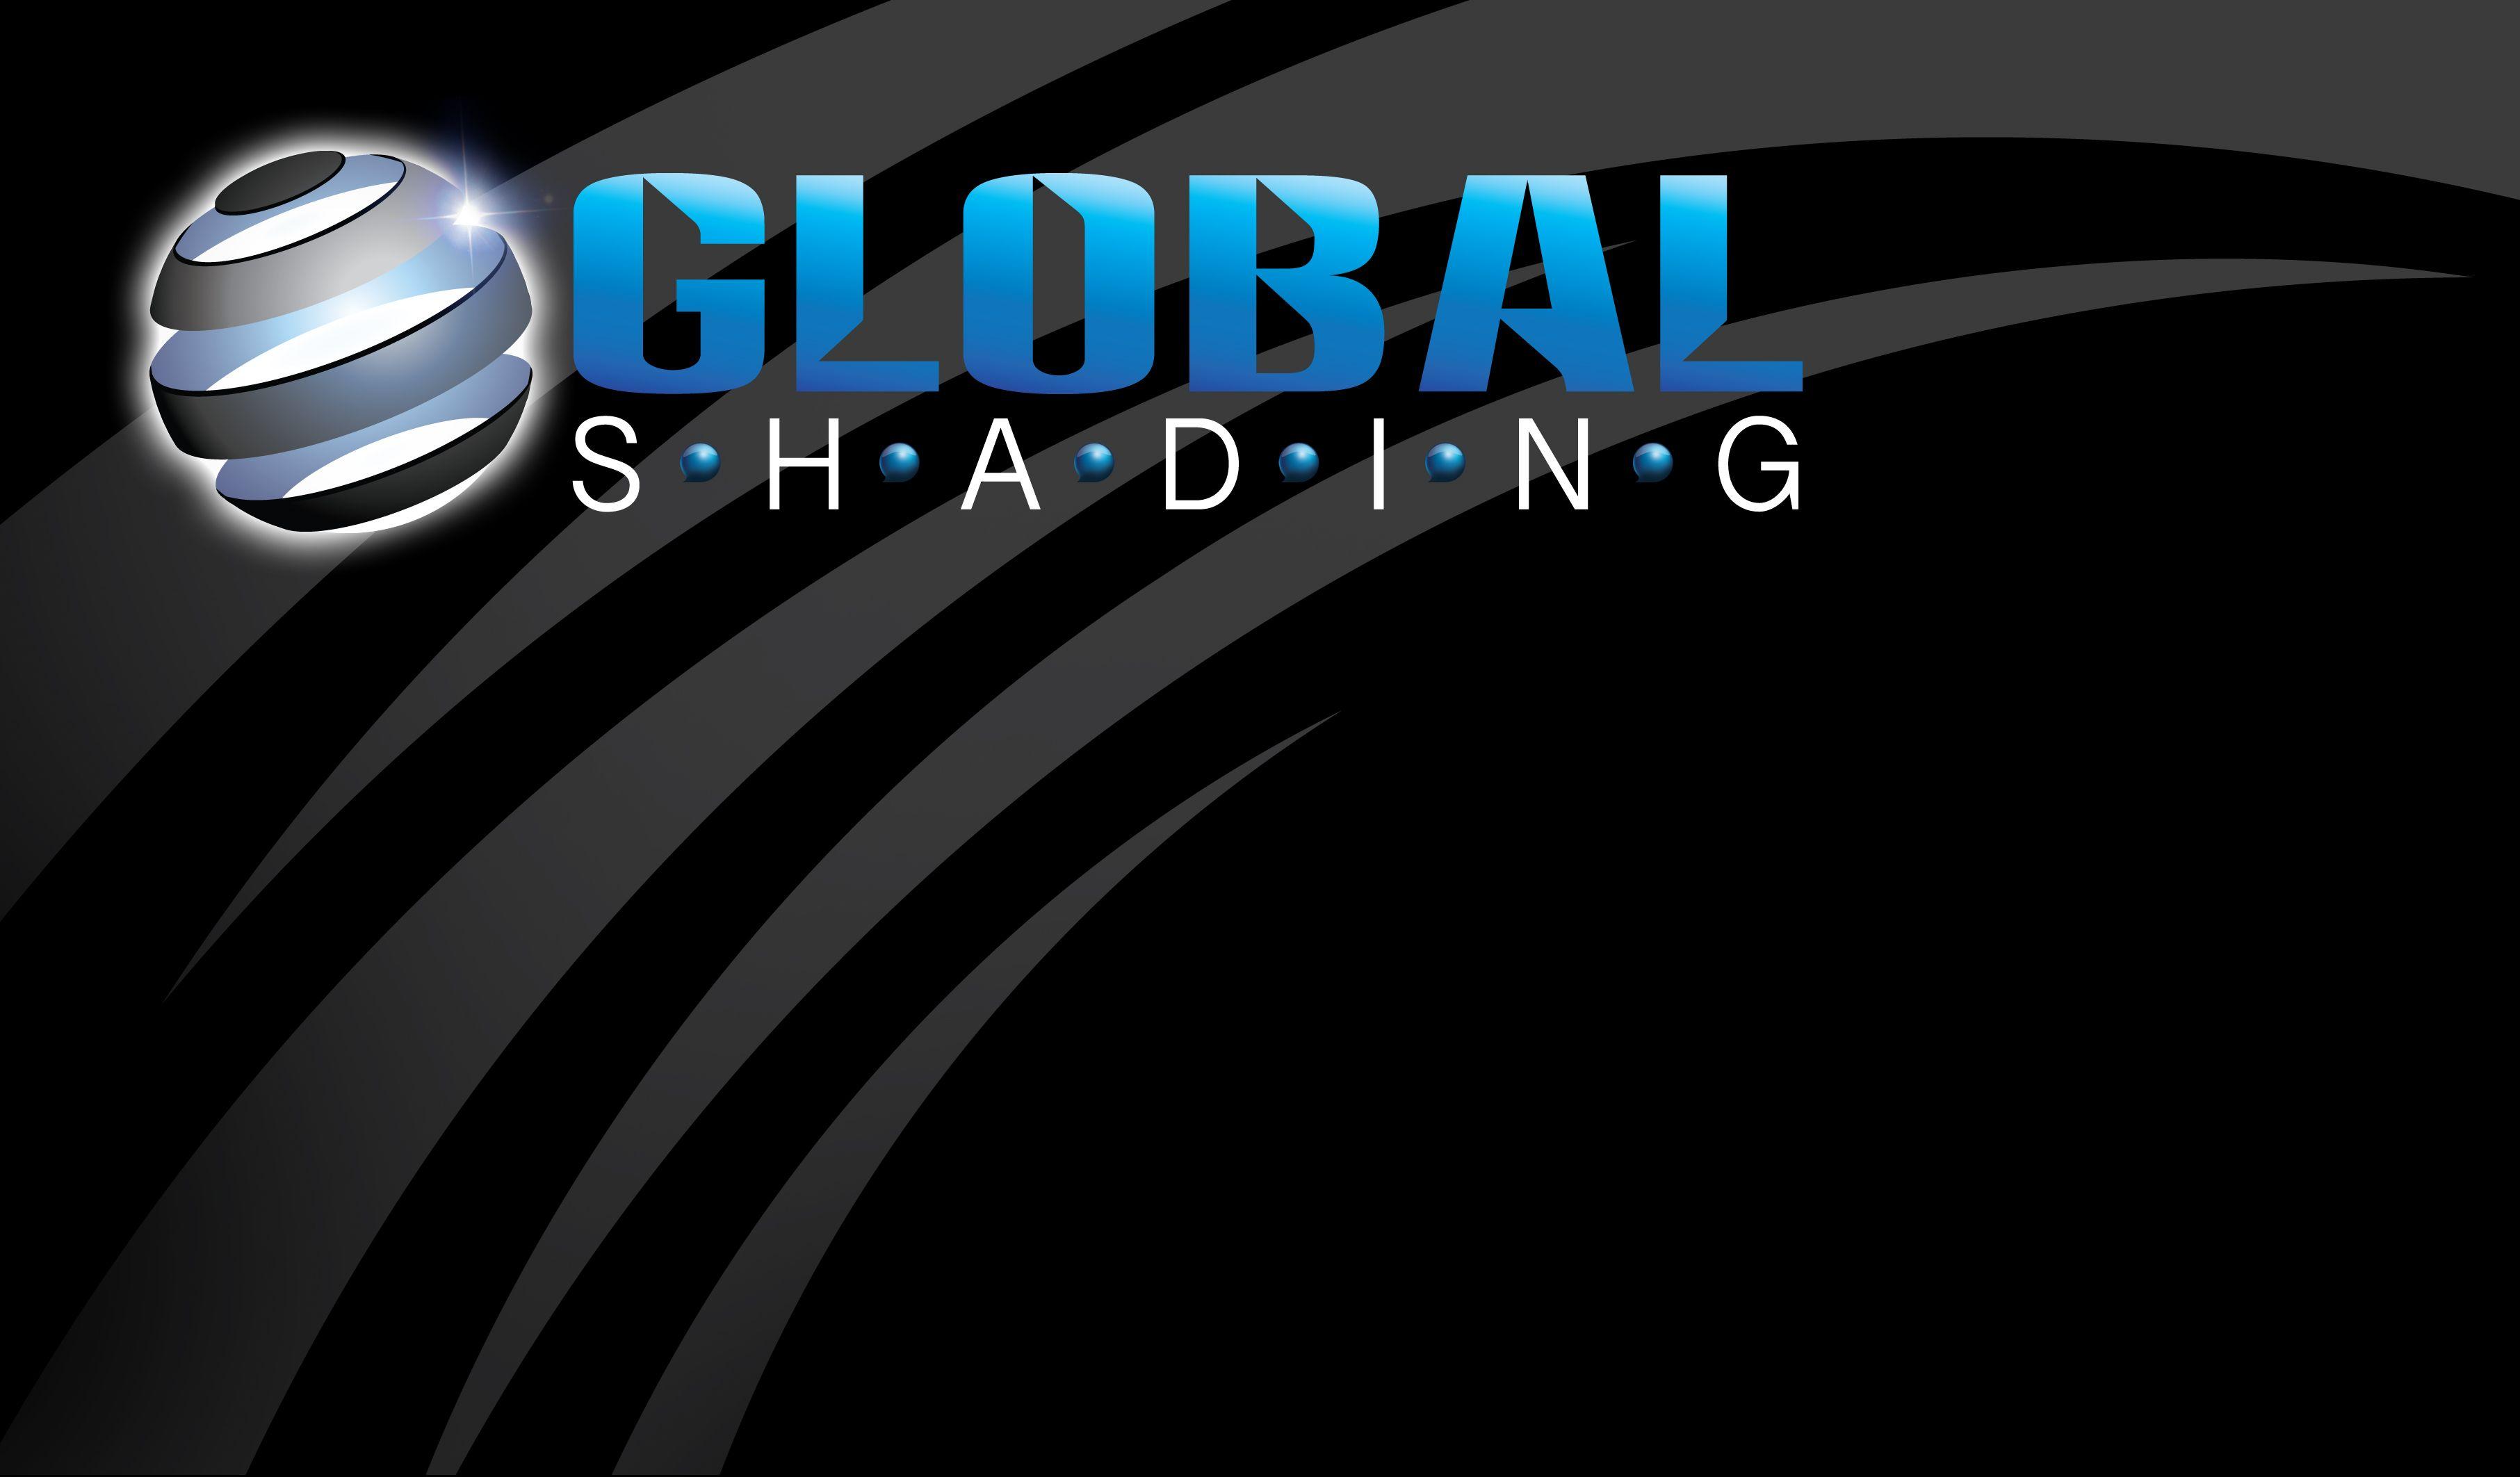 Global Shading Texas Window Glass Tinting Shades Global